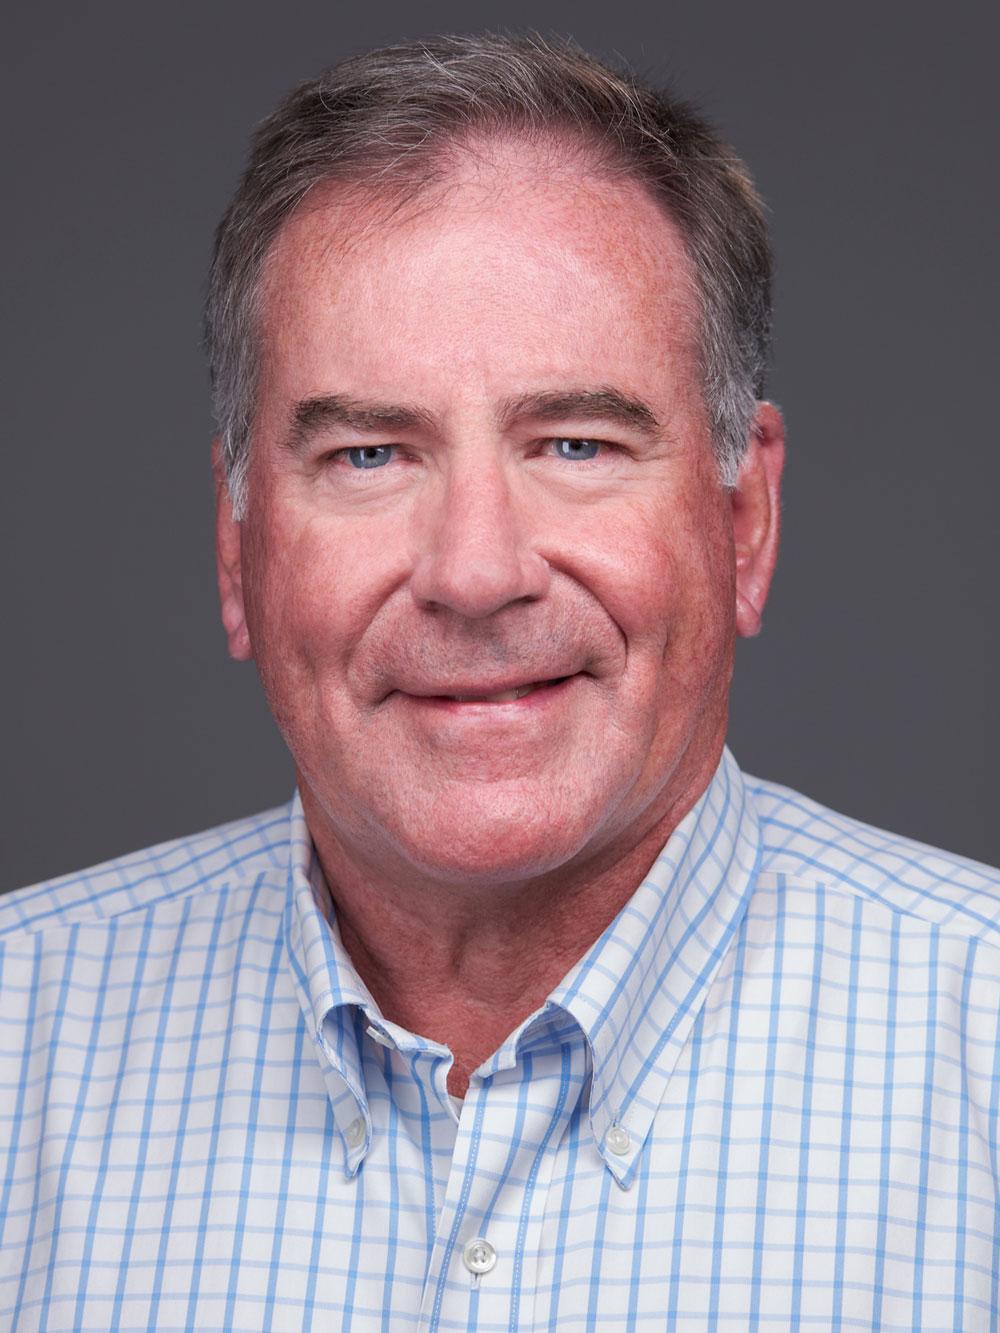 Craig Weber